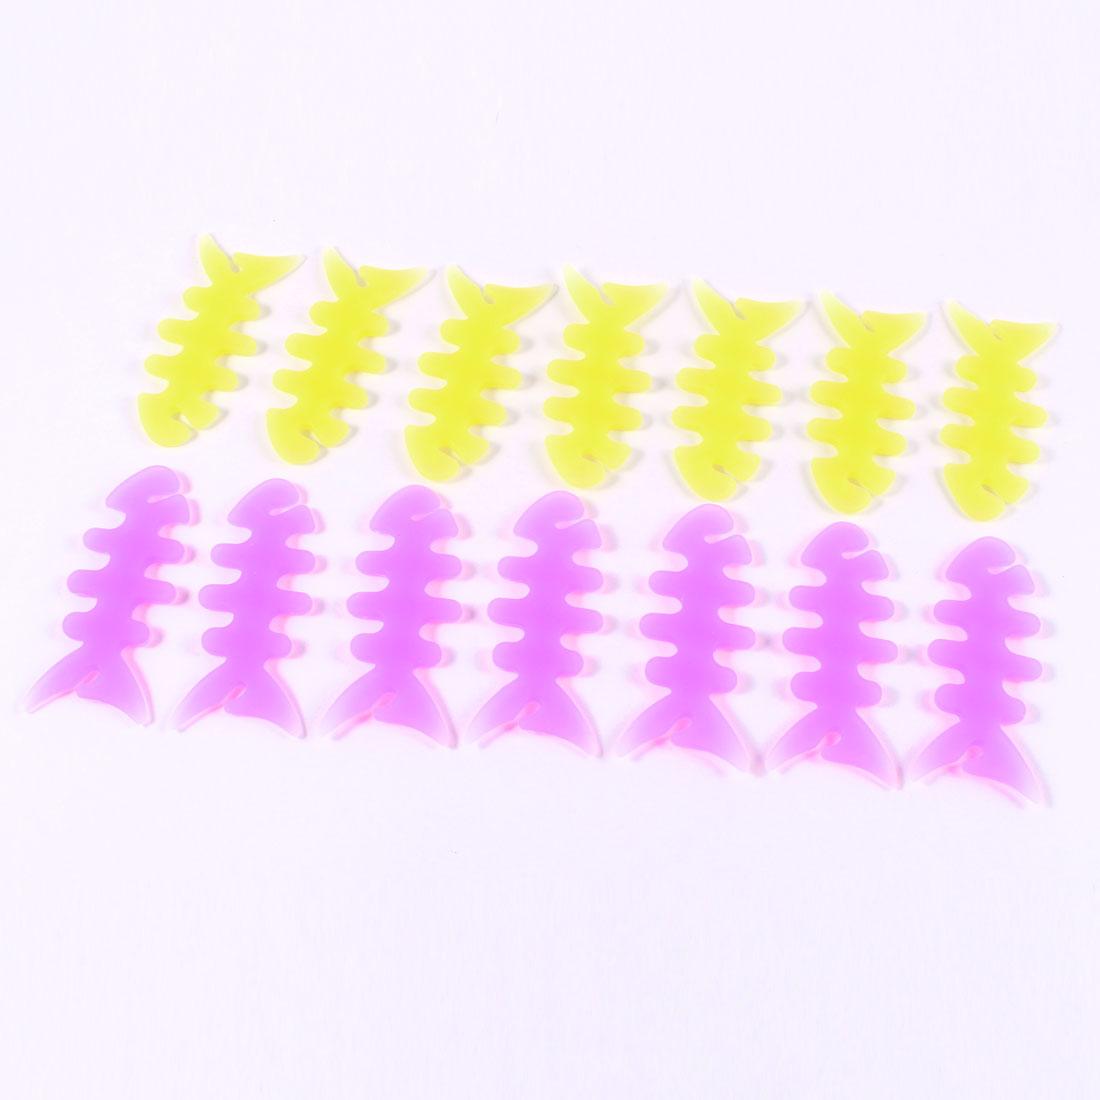 14 Pcs Yellow Fuchsia Rubber Fish Bone Design Headphone Cable Cord Winder Wrap